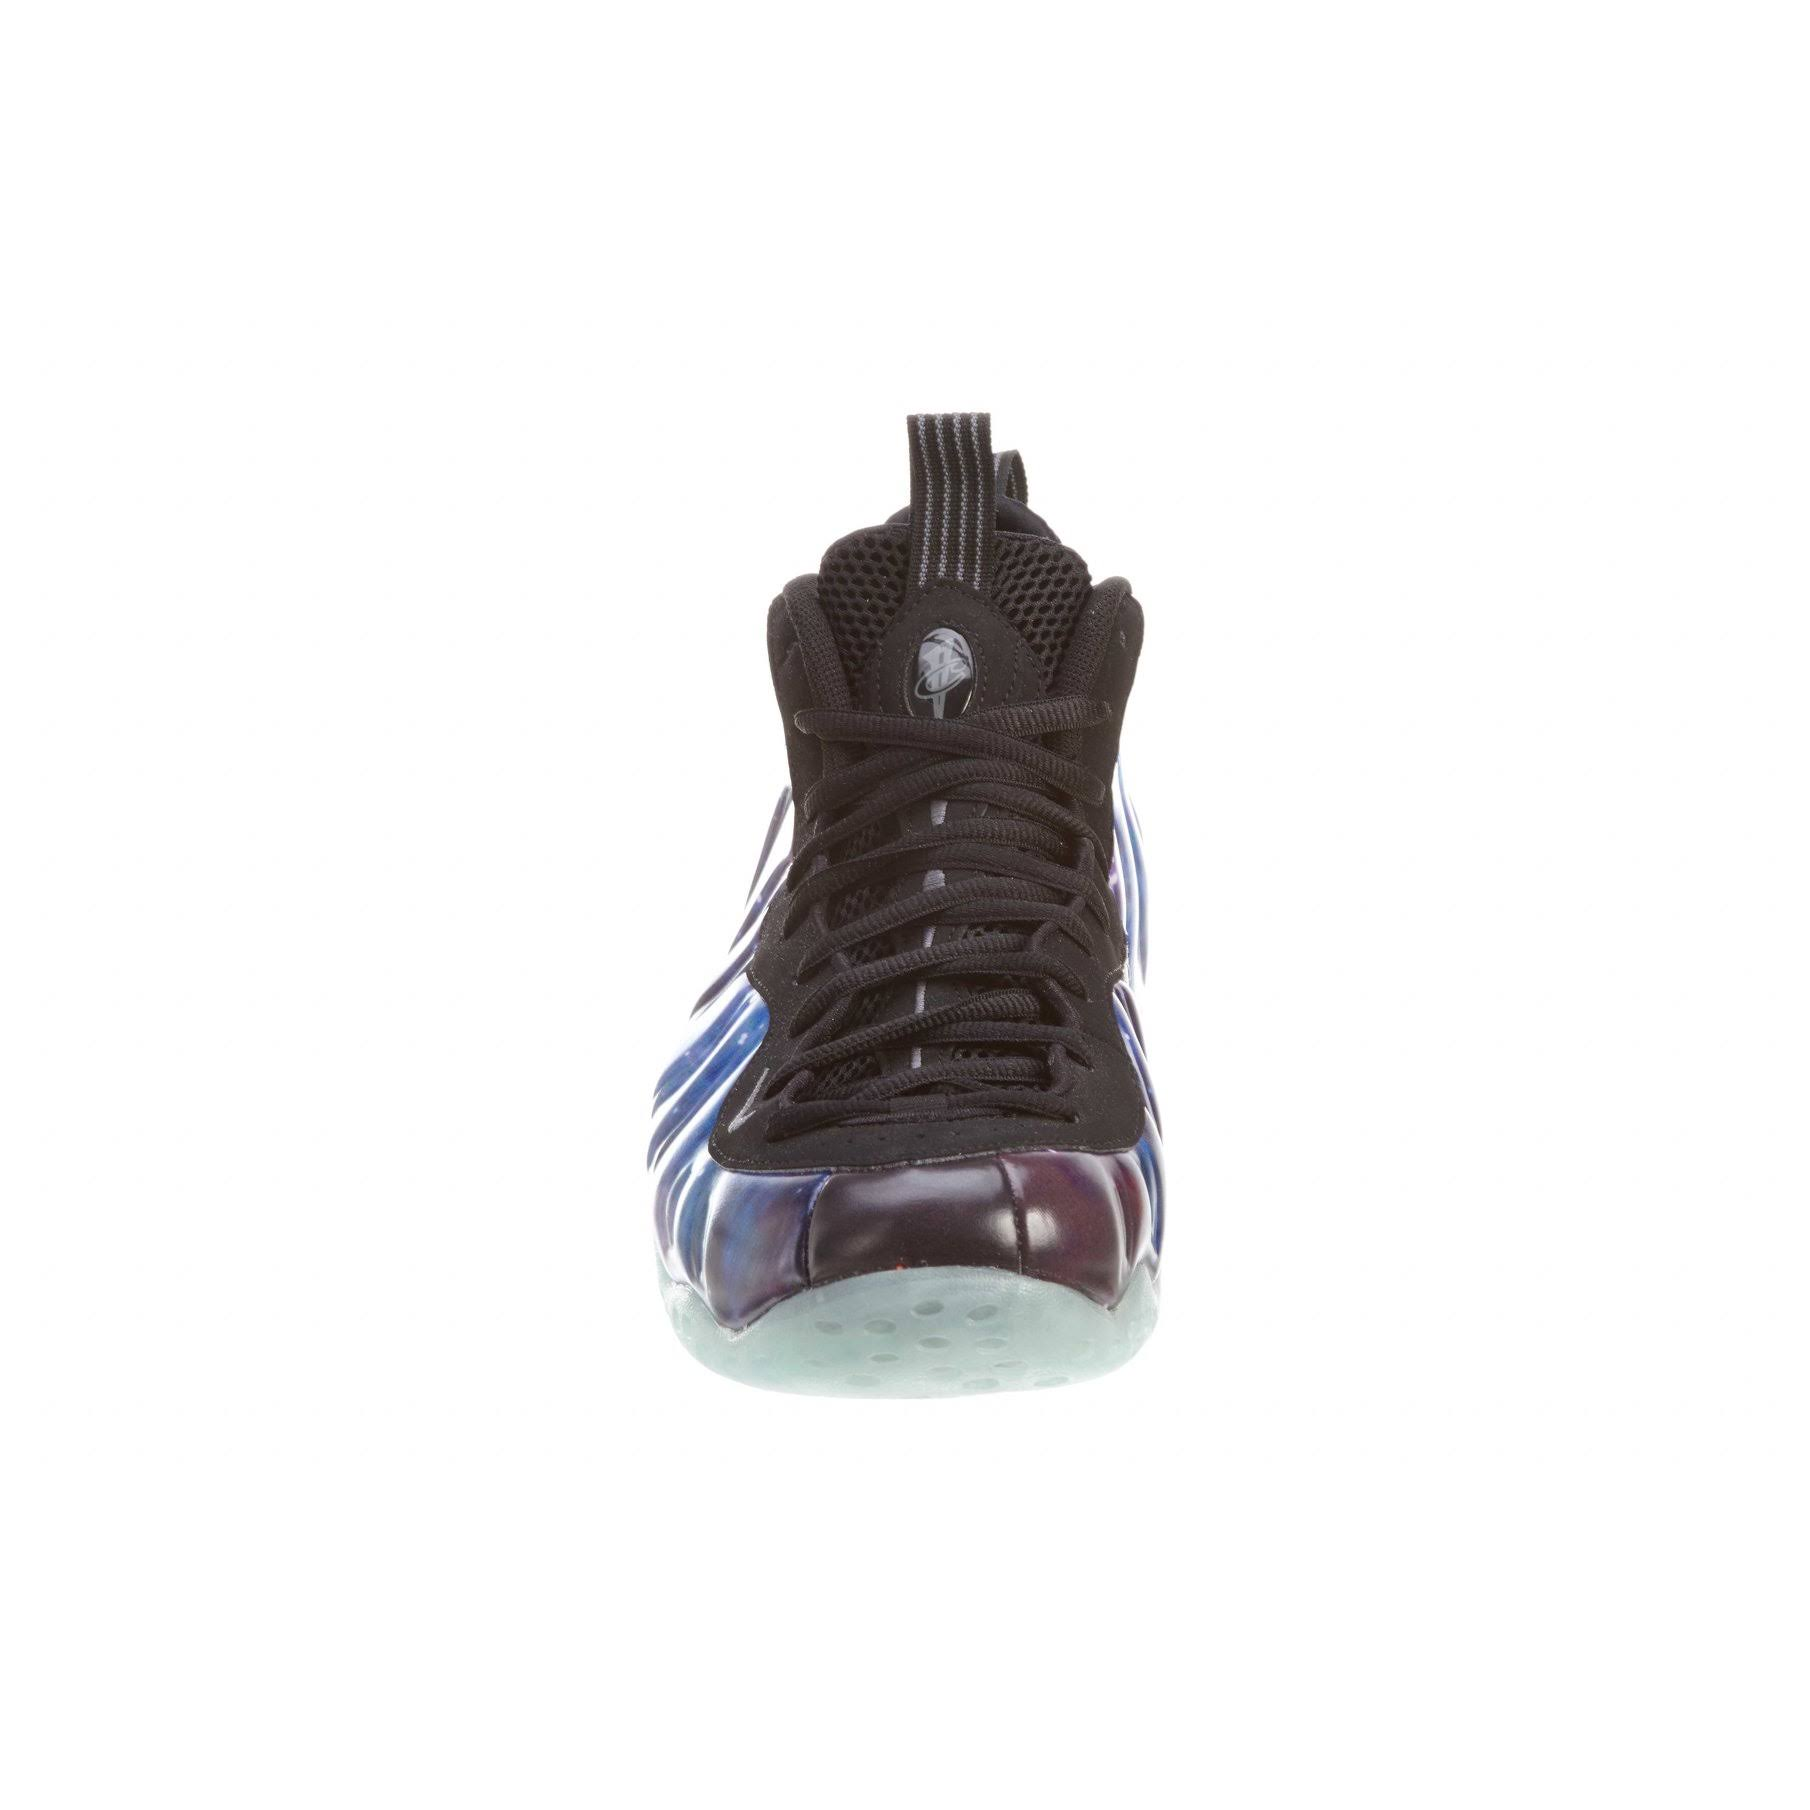 800 Air Galaxy 521286 Foamposite 14 Nike Nrg One 74w0q0